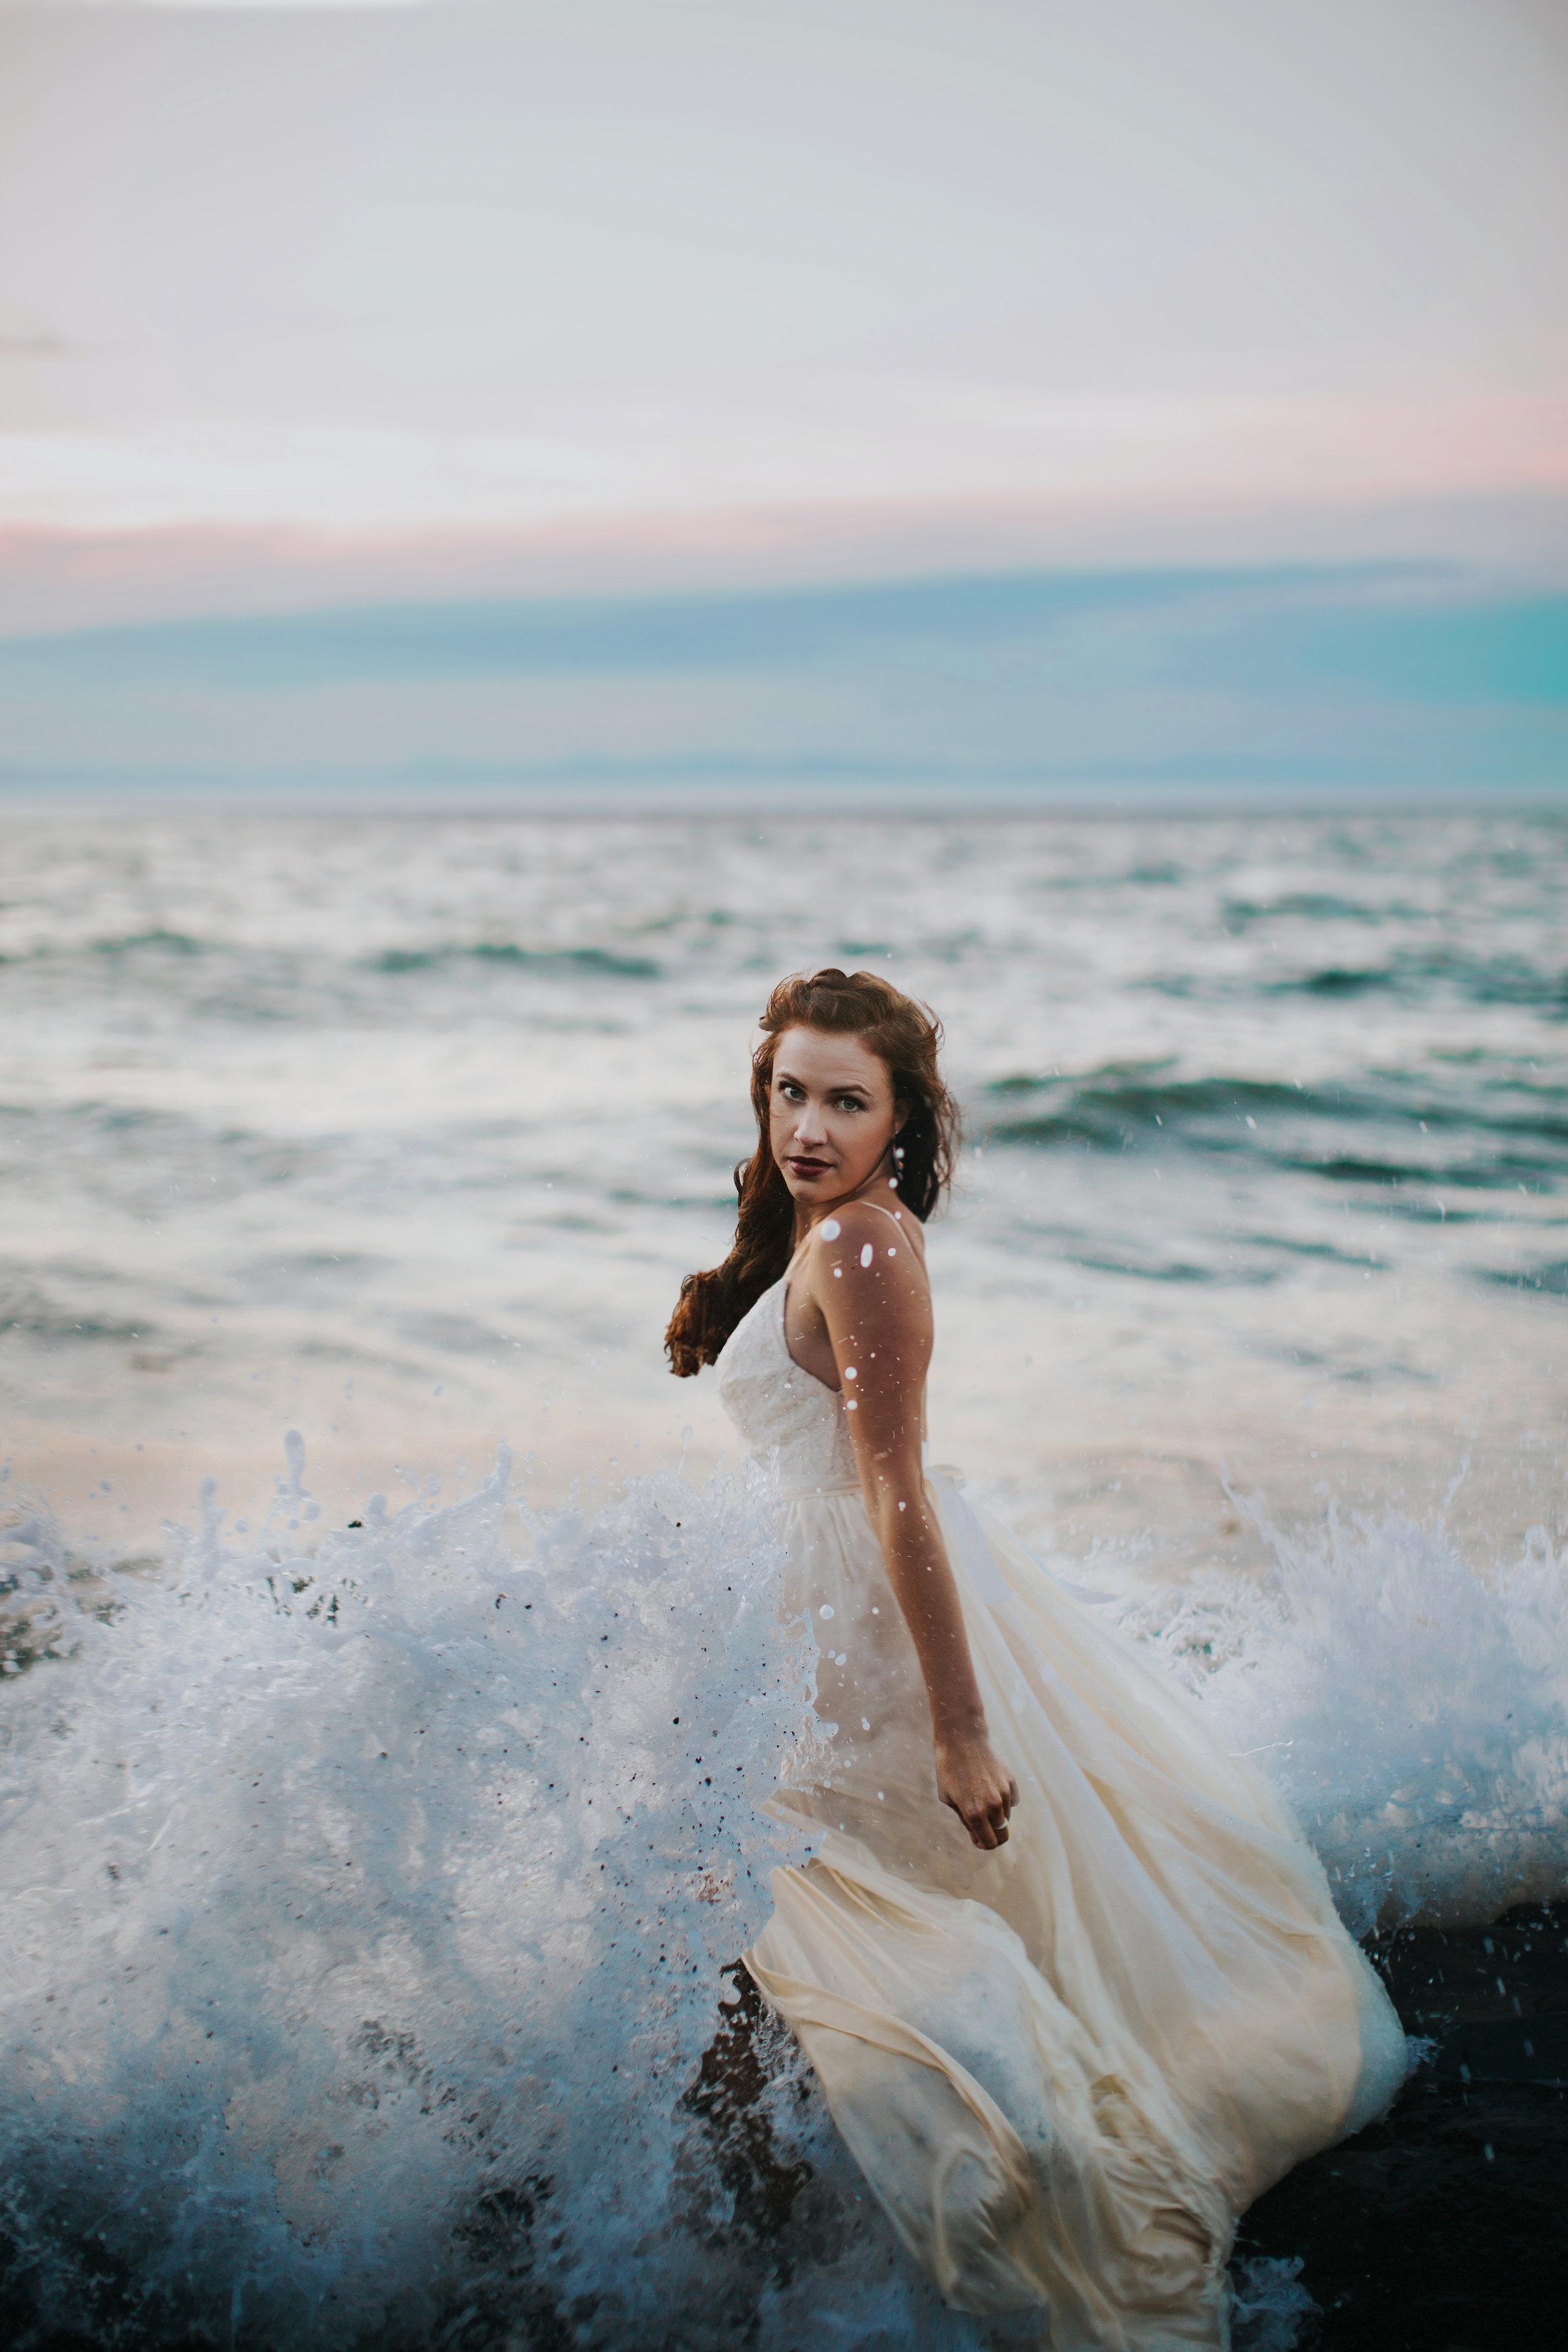 Port-Angeles-Photographer-Olympic-Peninsula-Wedding-Ediz-Hook-bride-dress-Kayla-Dawn-Photography-Olympic-Peninsula-PNW-Photographer-Portrait-Portraiture-Natural-Golden-Hour-Beach (17).jpg